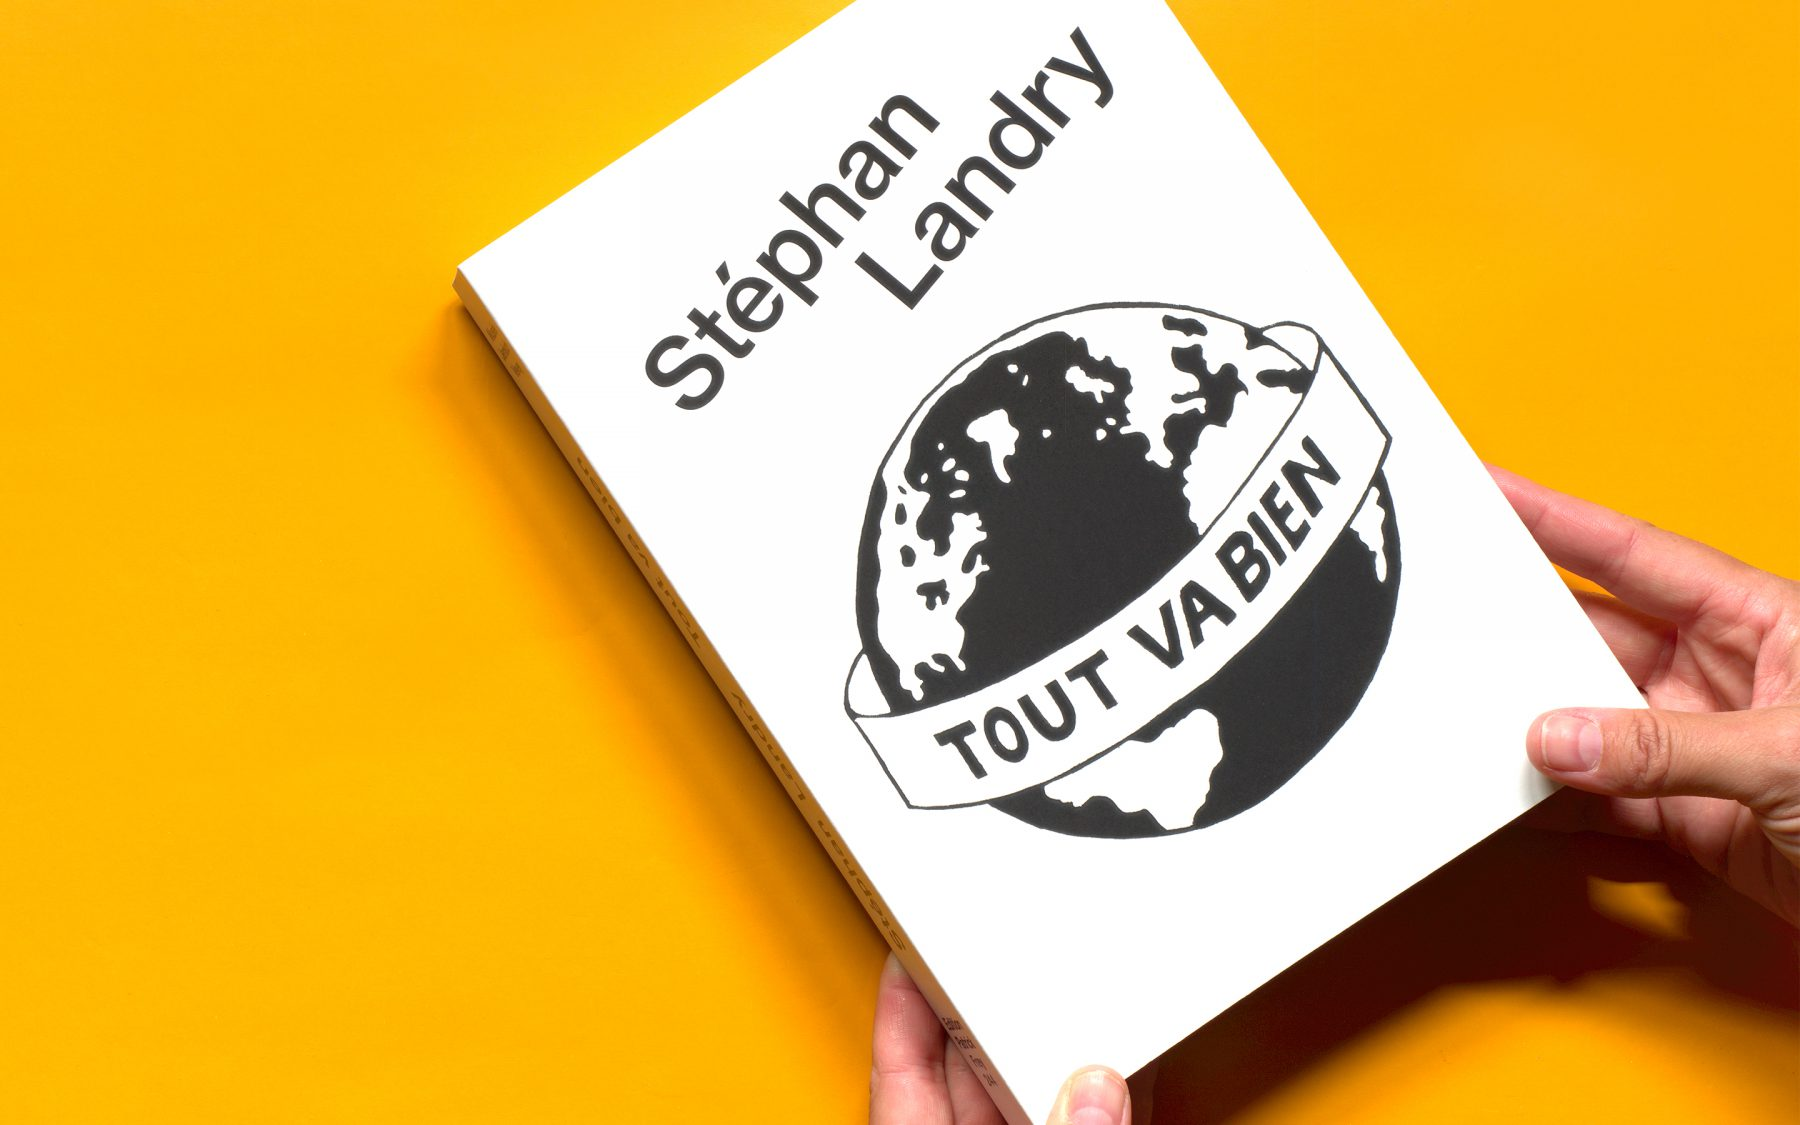 Stéphan Landry